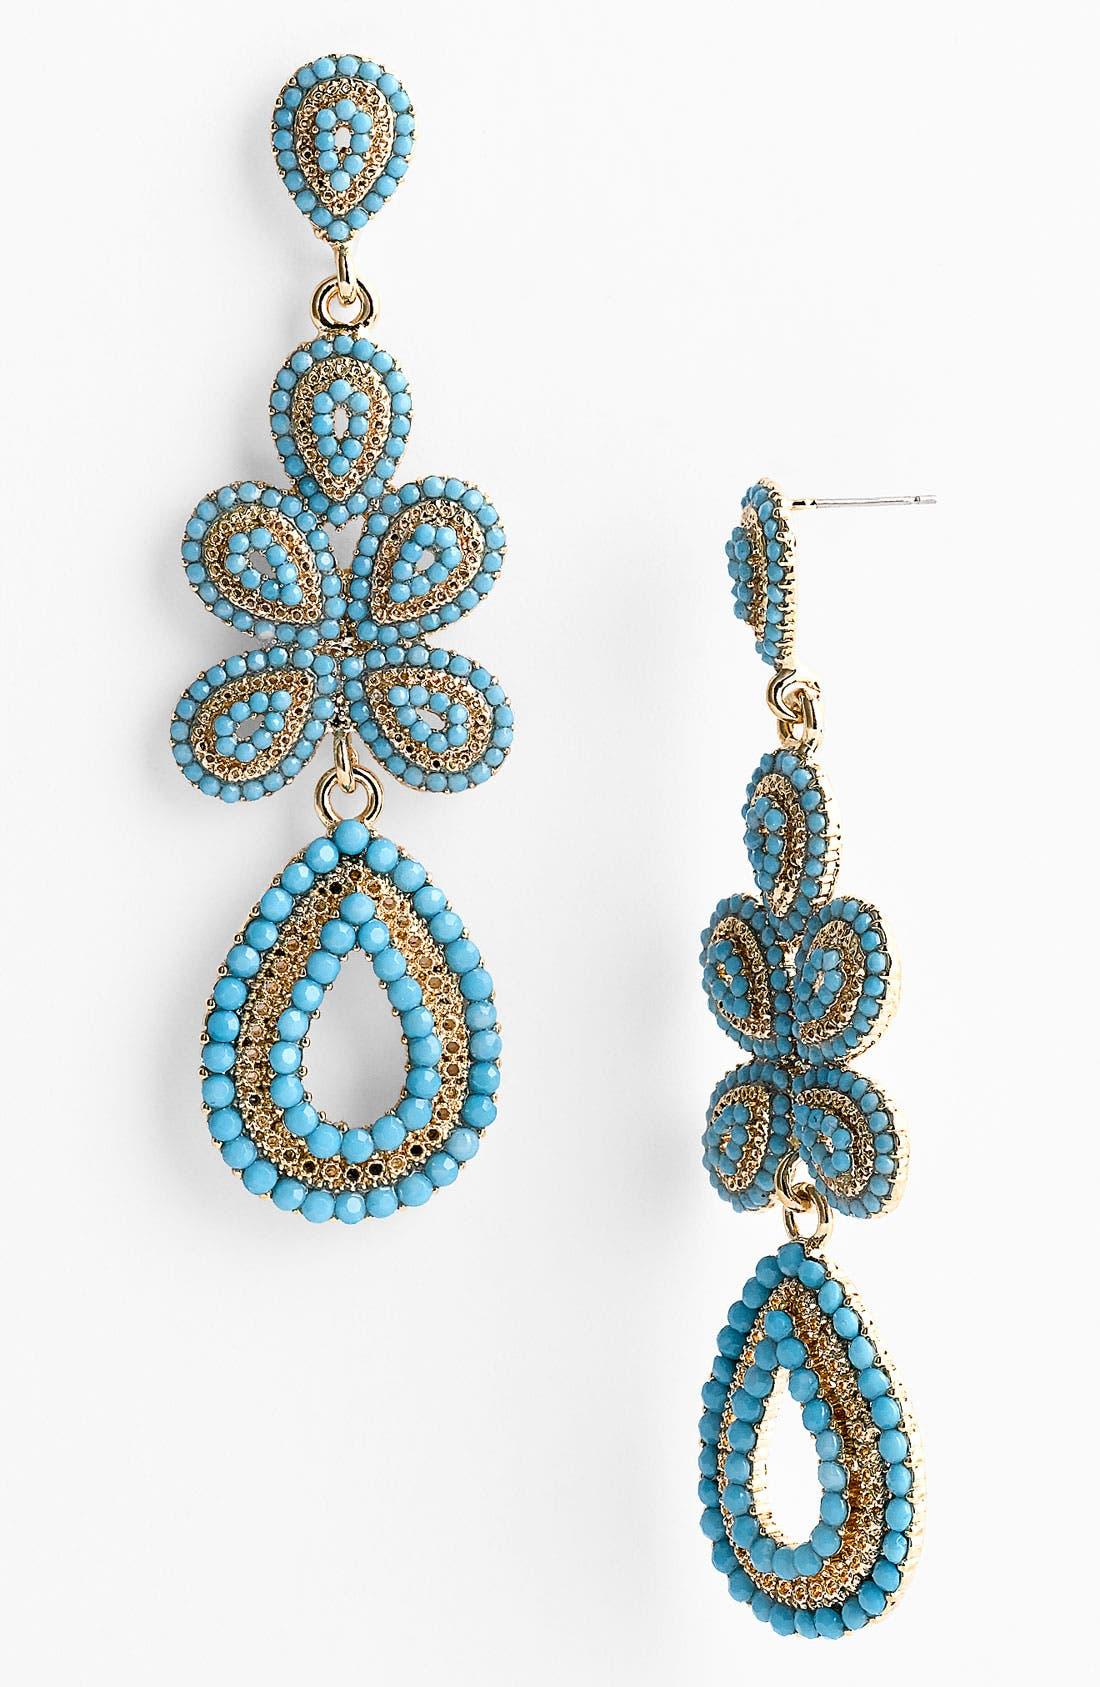 'Ornate' Linear Statement Earrings,                             Main thumbnail 10, color,